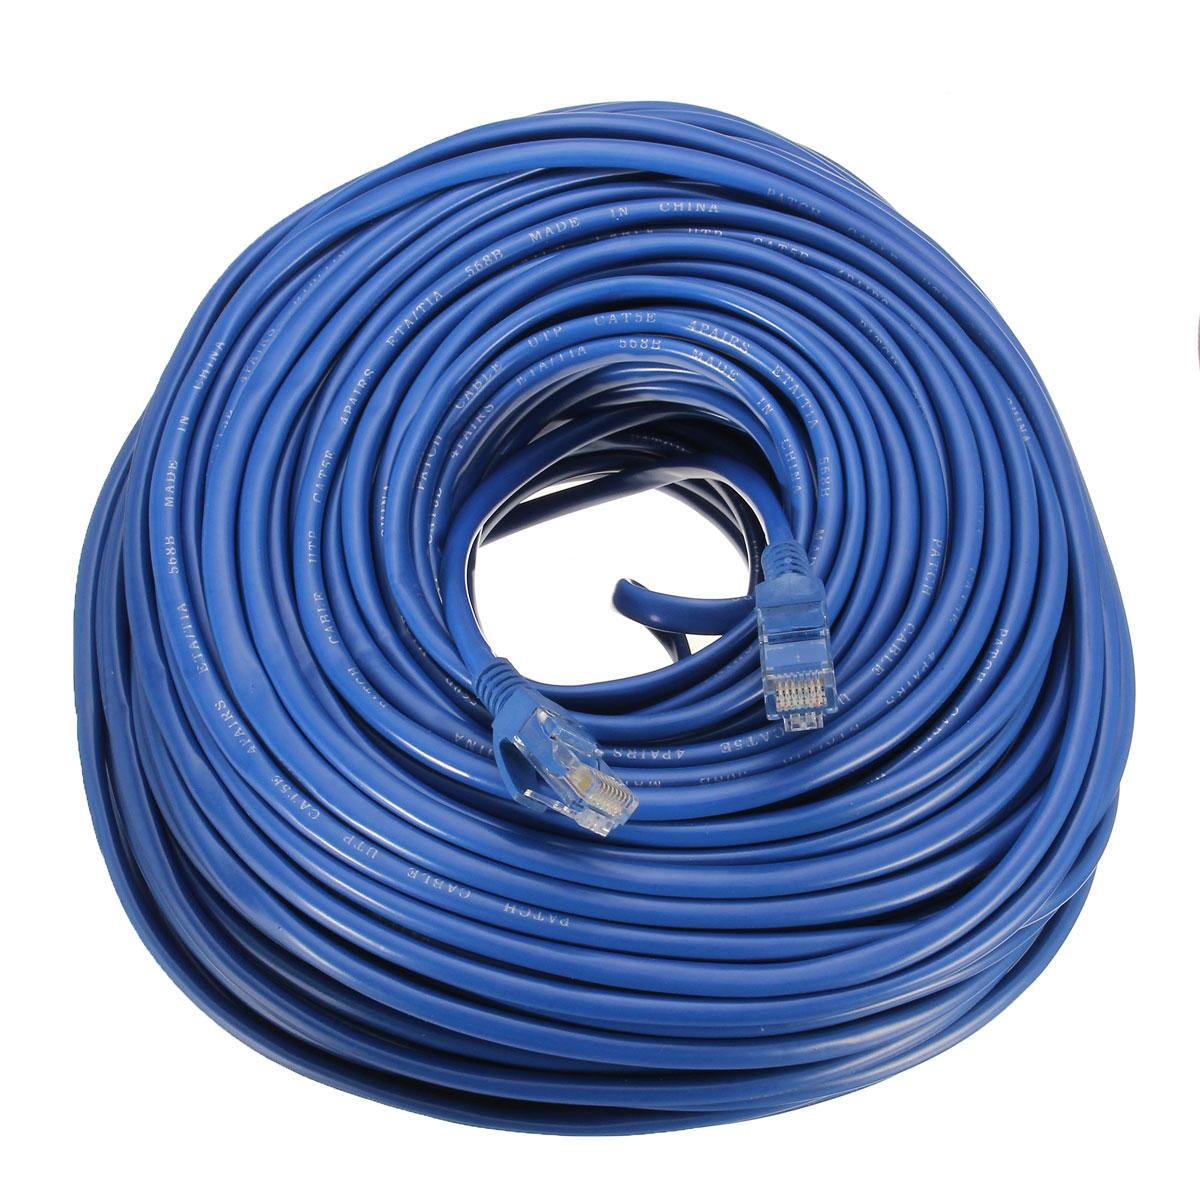 Admirable 50M Cat5 Cat5E Rj45 Ethernet Lan Network Cable Line 10Mbps 100Mbps Wiring Digital Resources Operbouhousnl